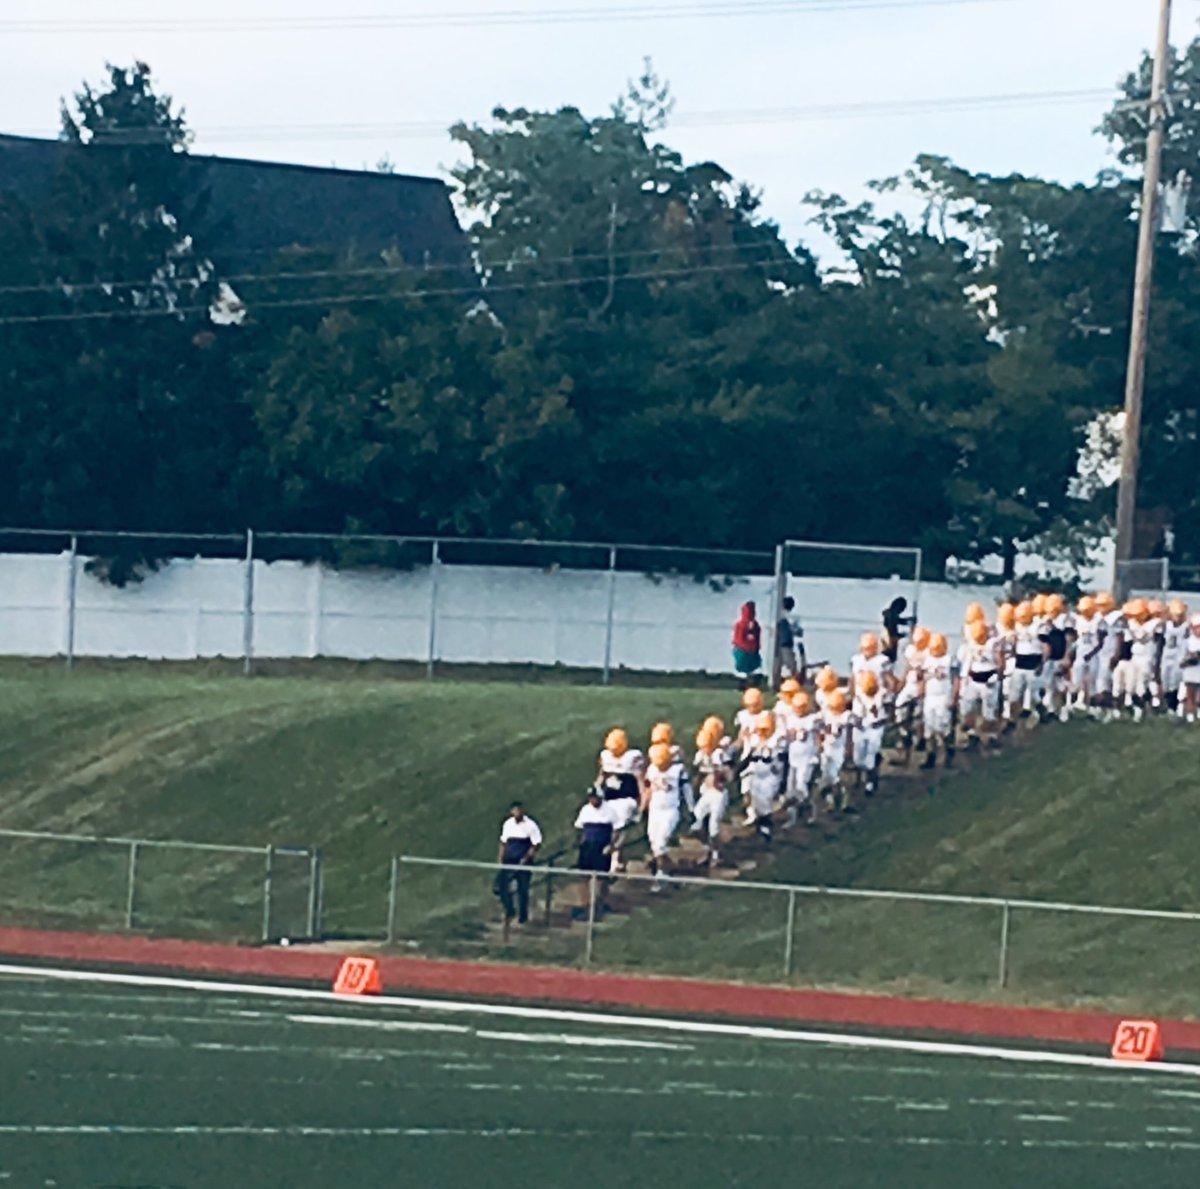 Always love watching the team walk into the battle! #PurpleReign